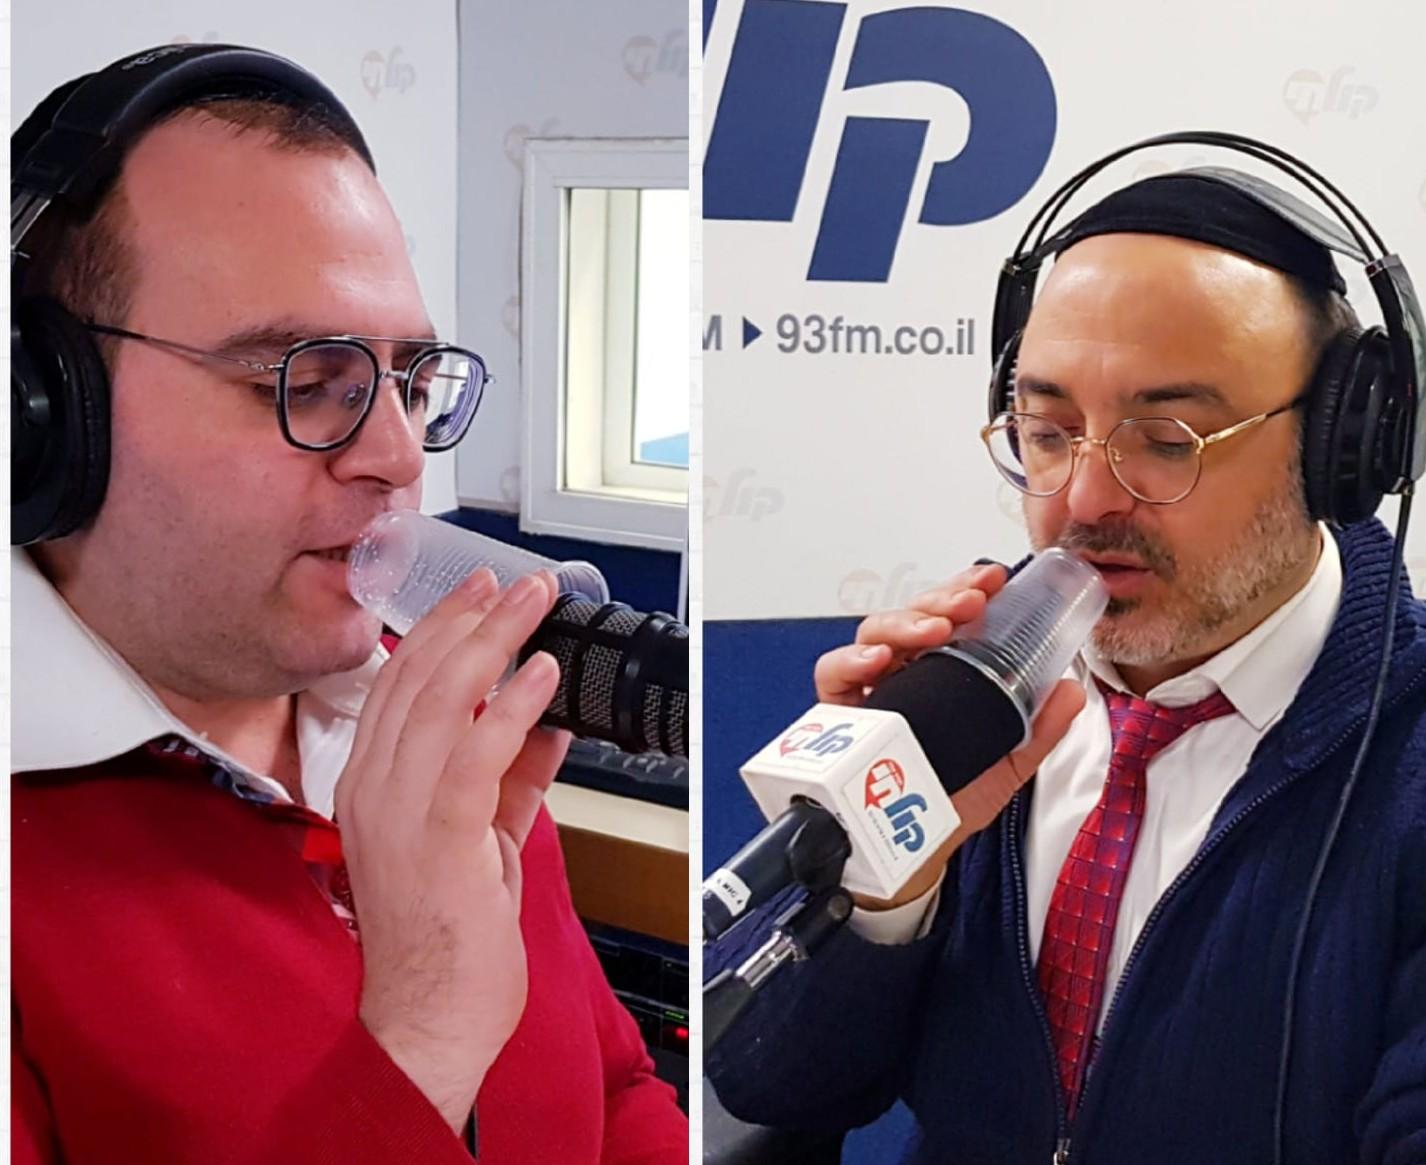 WhatsApp Image 2019-01-10 at 20.01.00 שוקרון ואלעד עם כוס חד פעמית